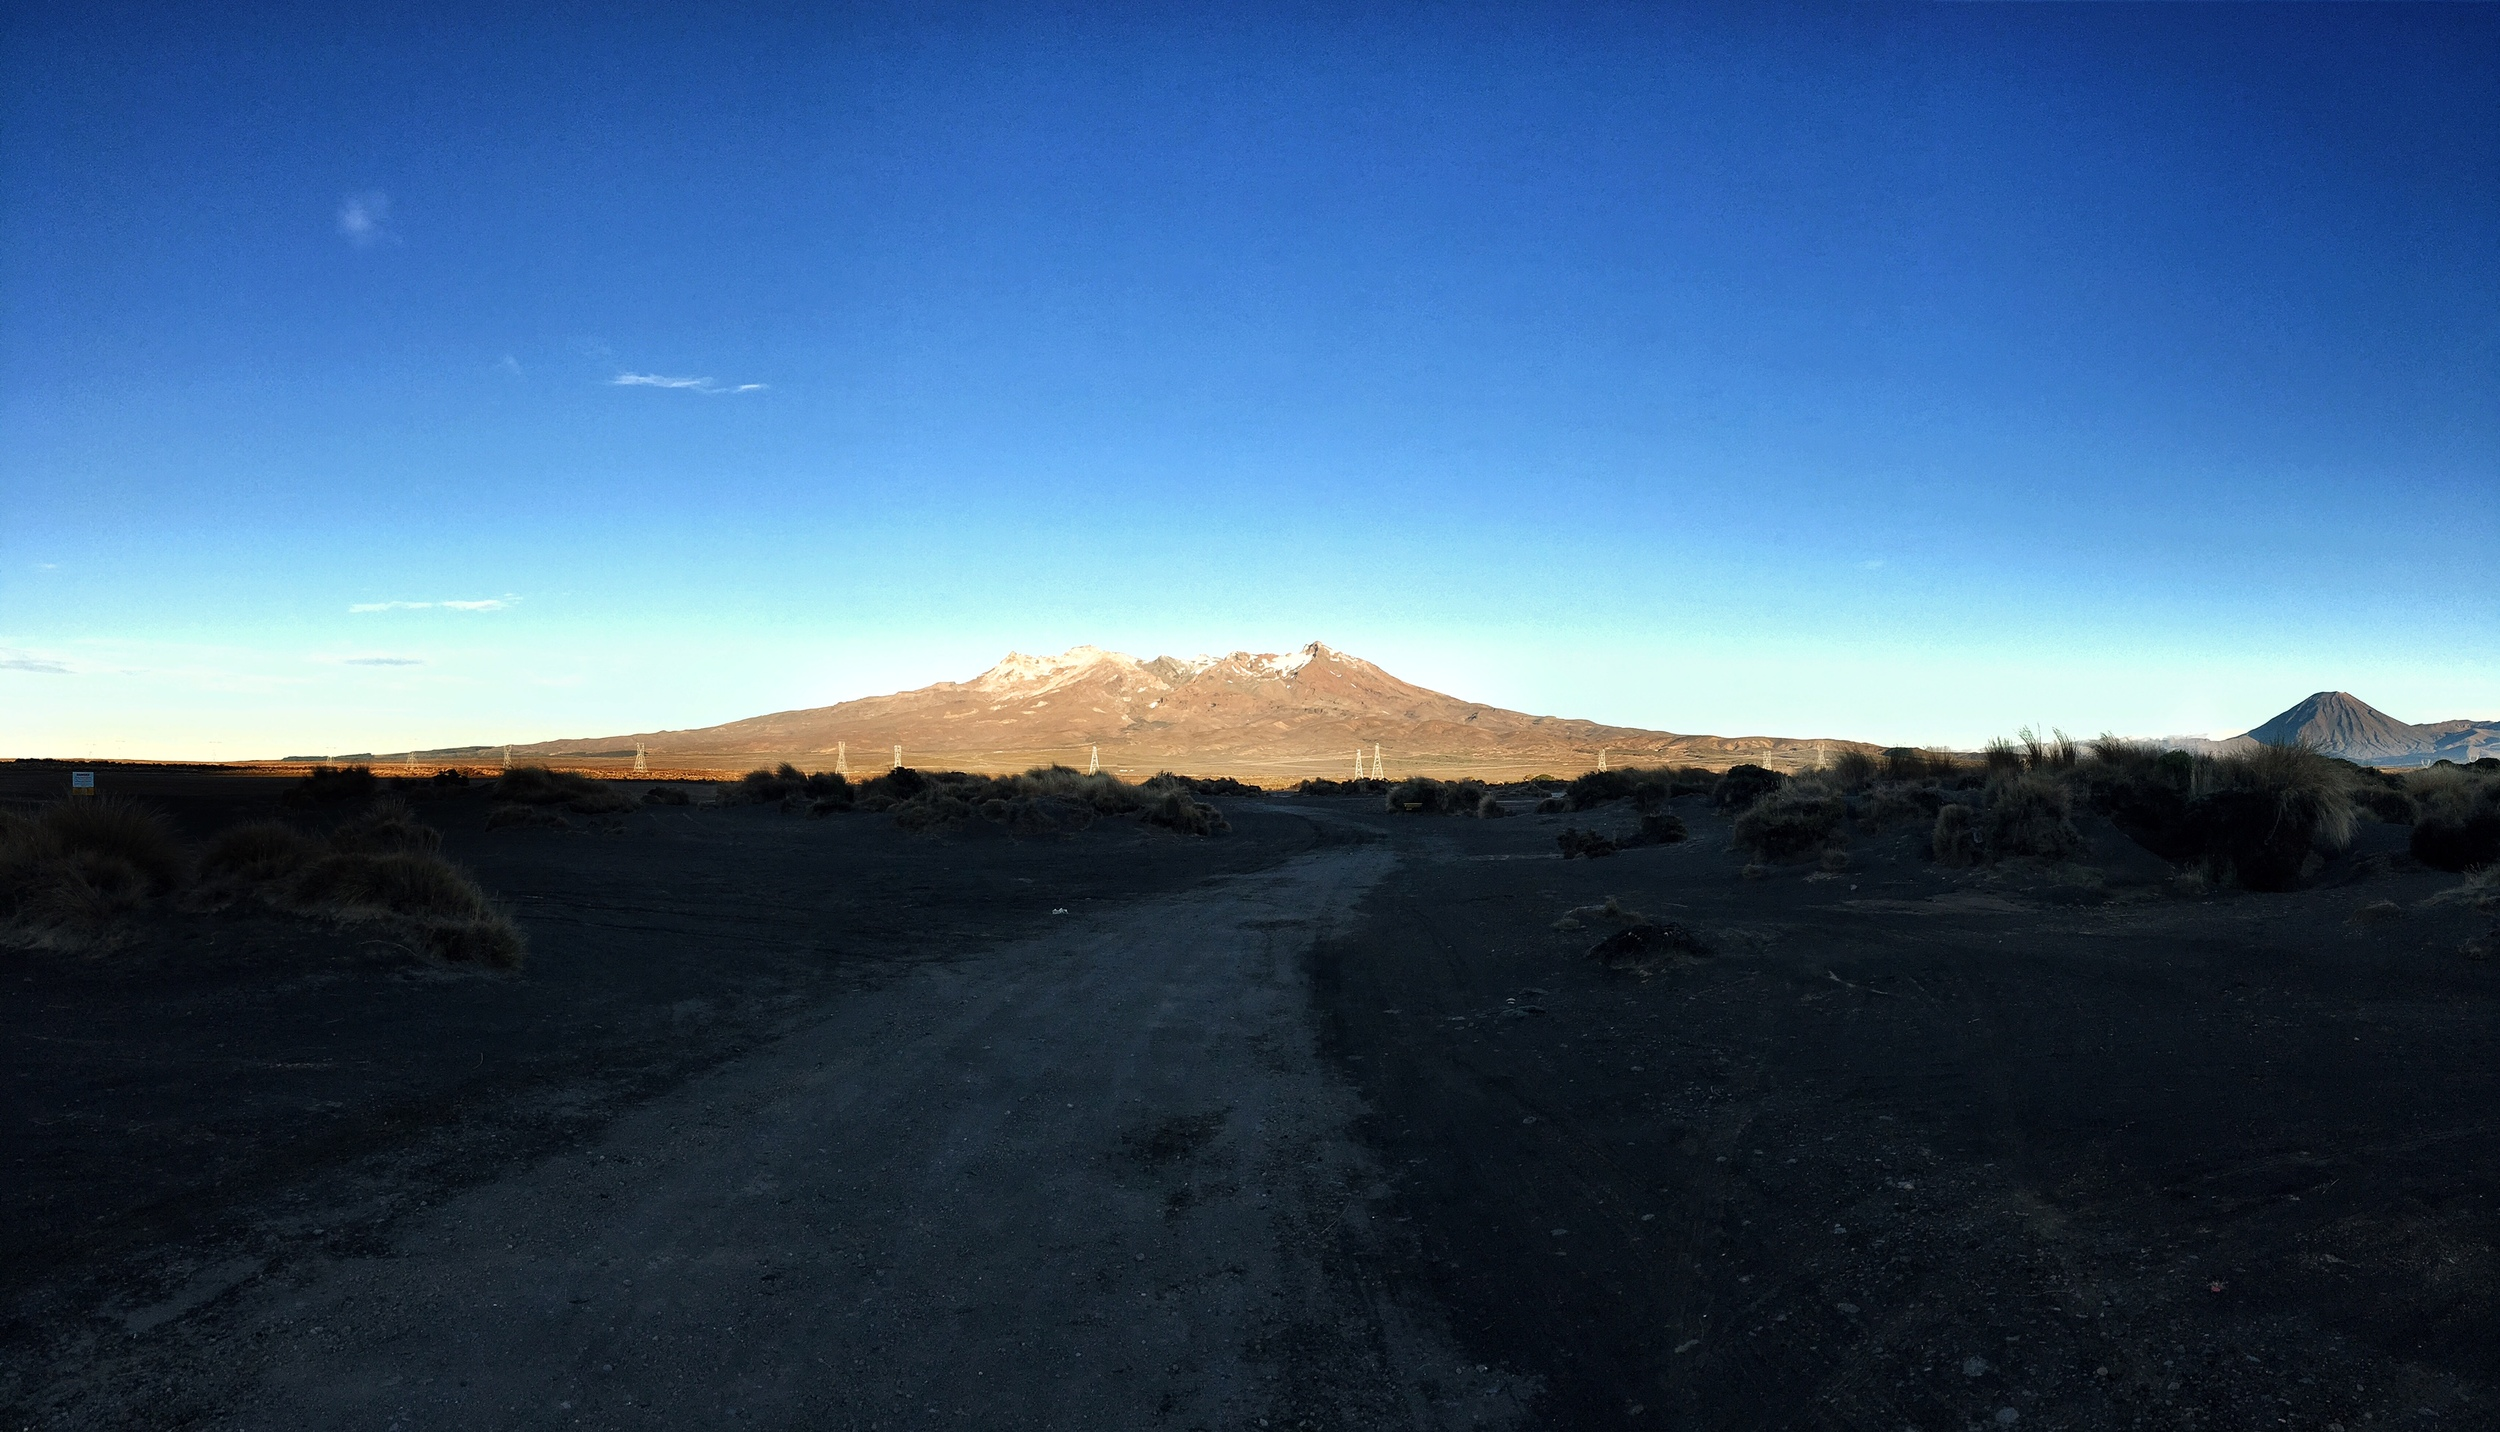 // Tongariro National Park at sunrise